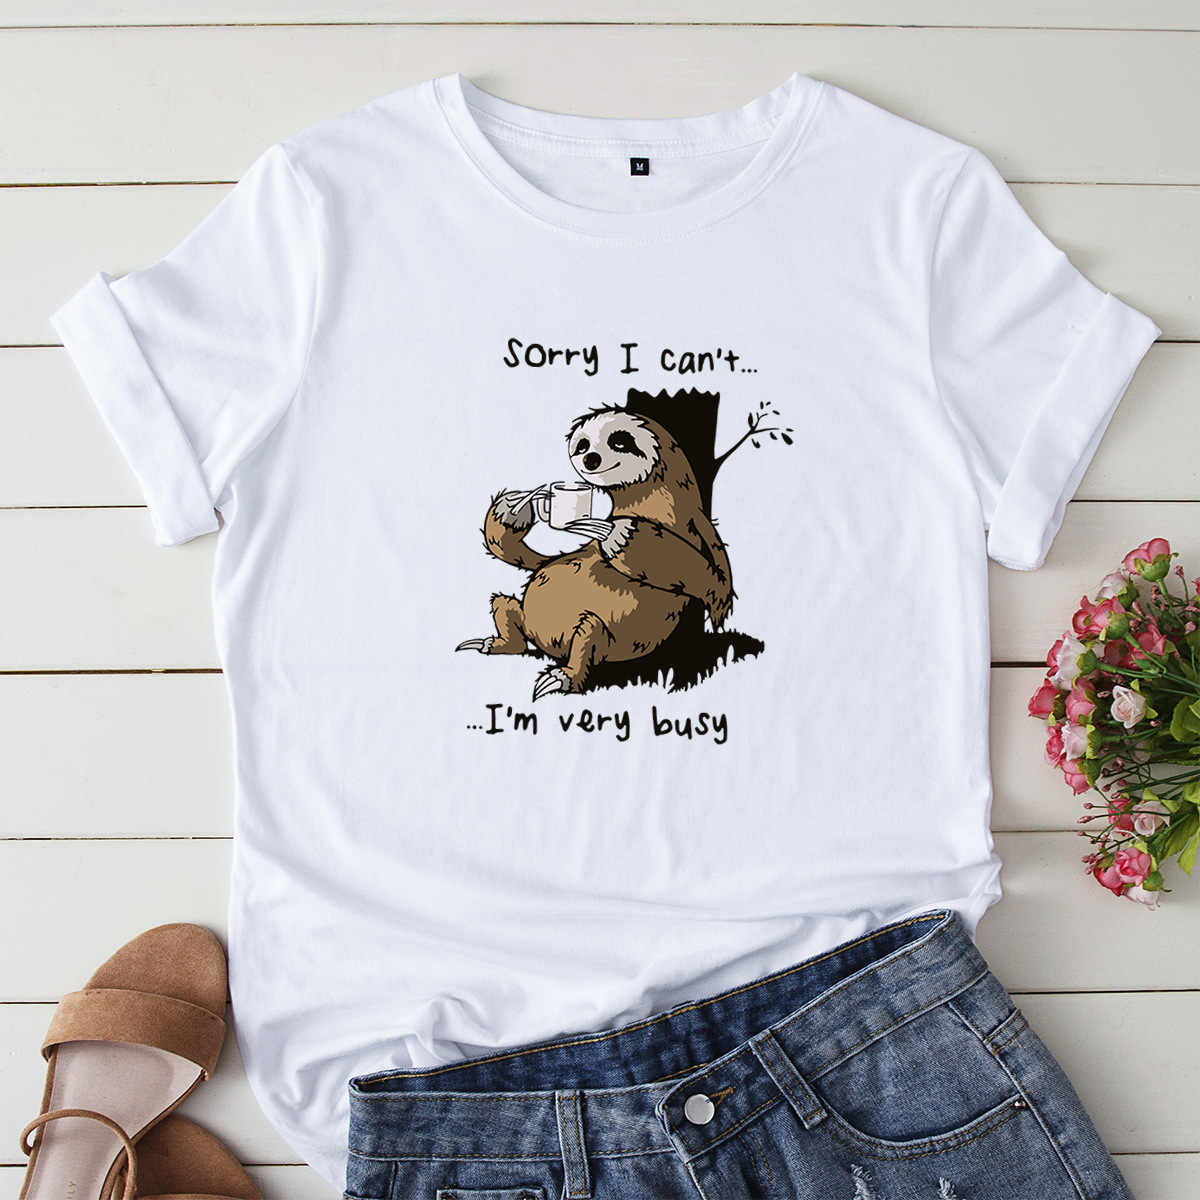 100% algodón perezoso estampado Mujer camiseta verano moda Tops talla grande Animal dibujo Kawaii camiseta Rosa nuevo